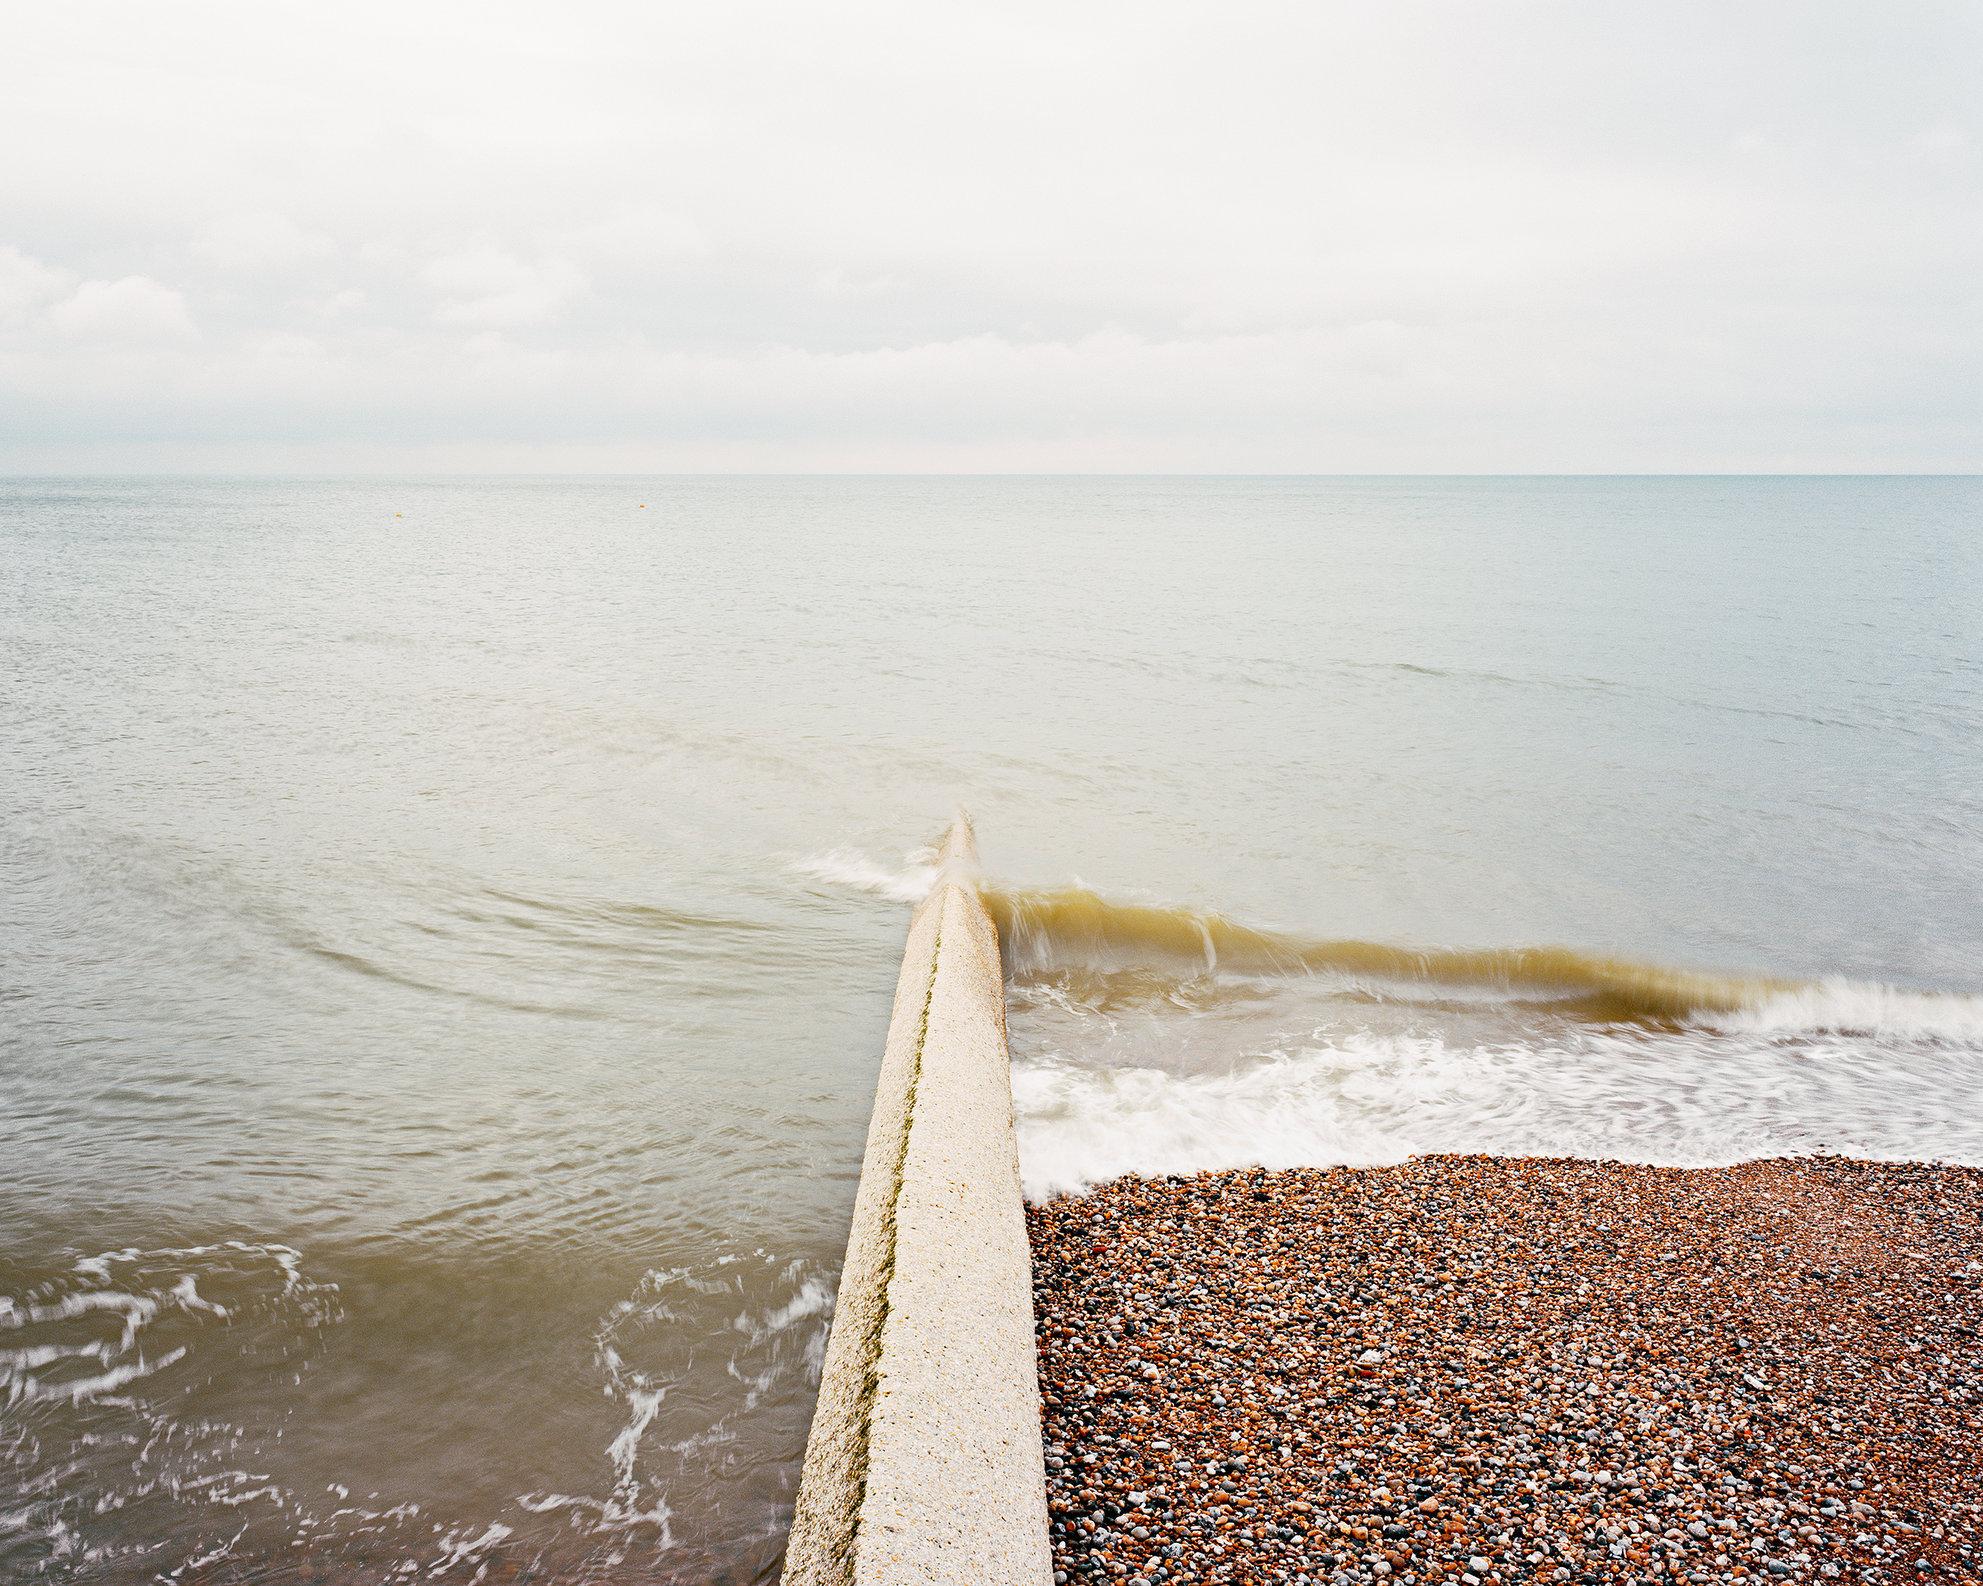 Groyne and Shingle Beach, Hove